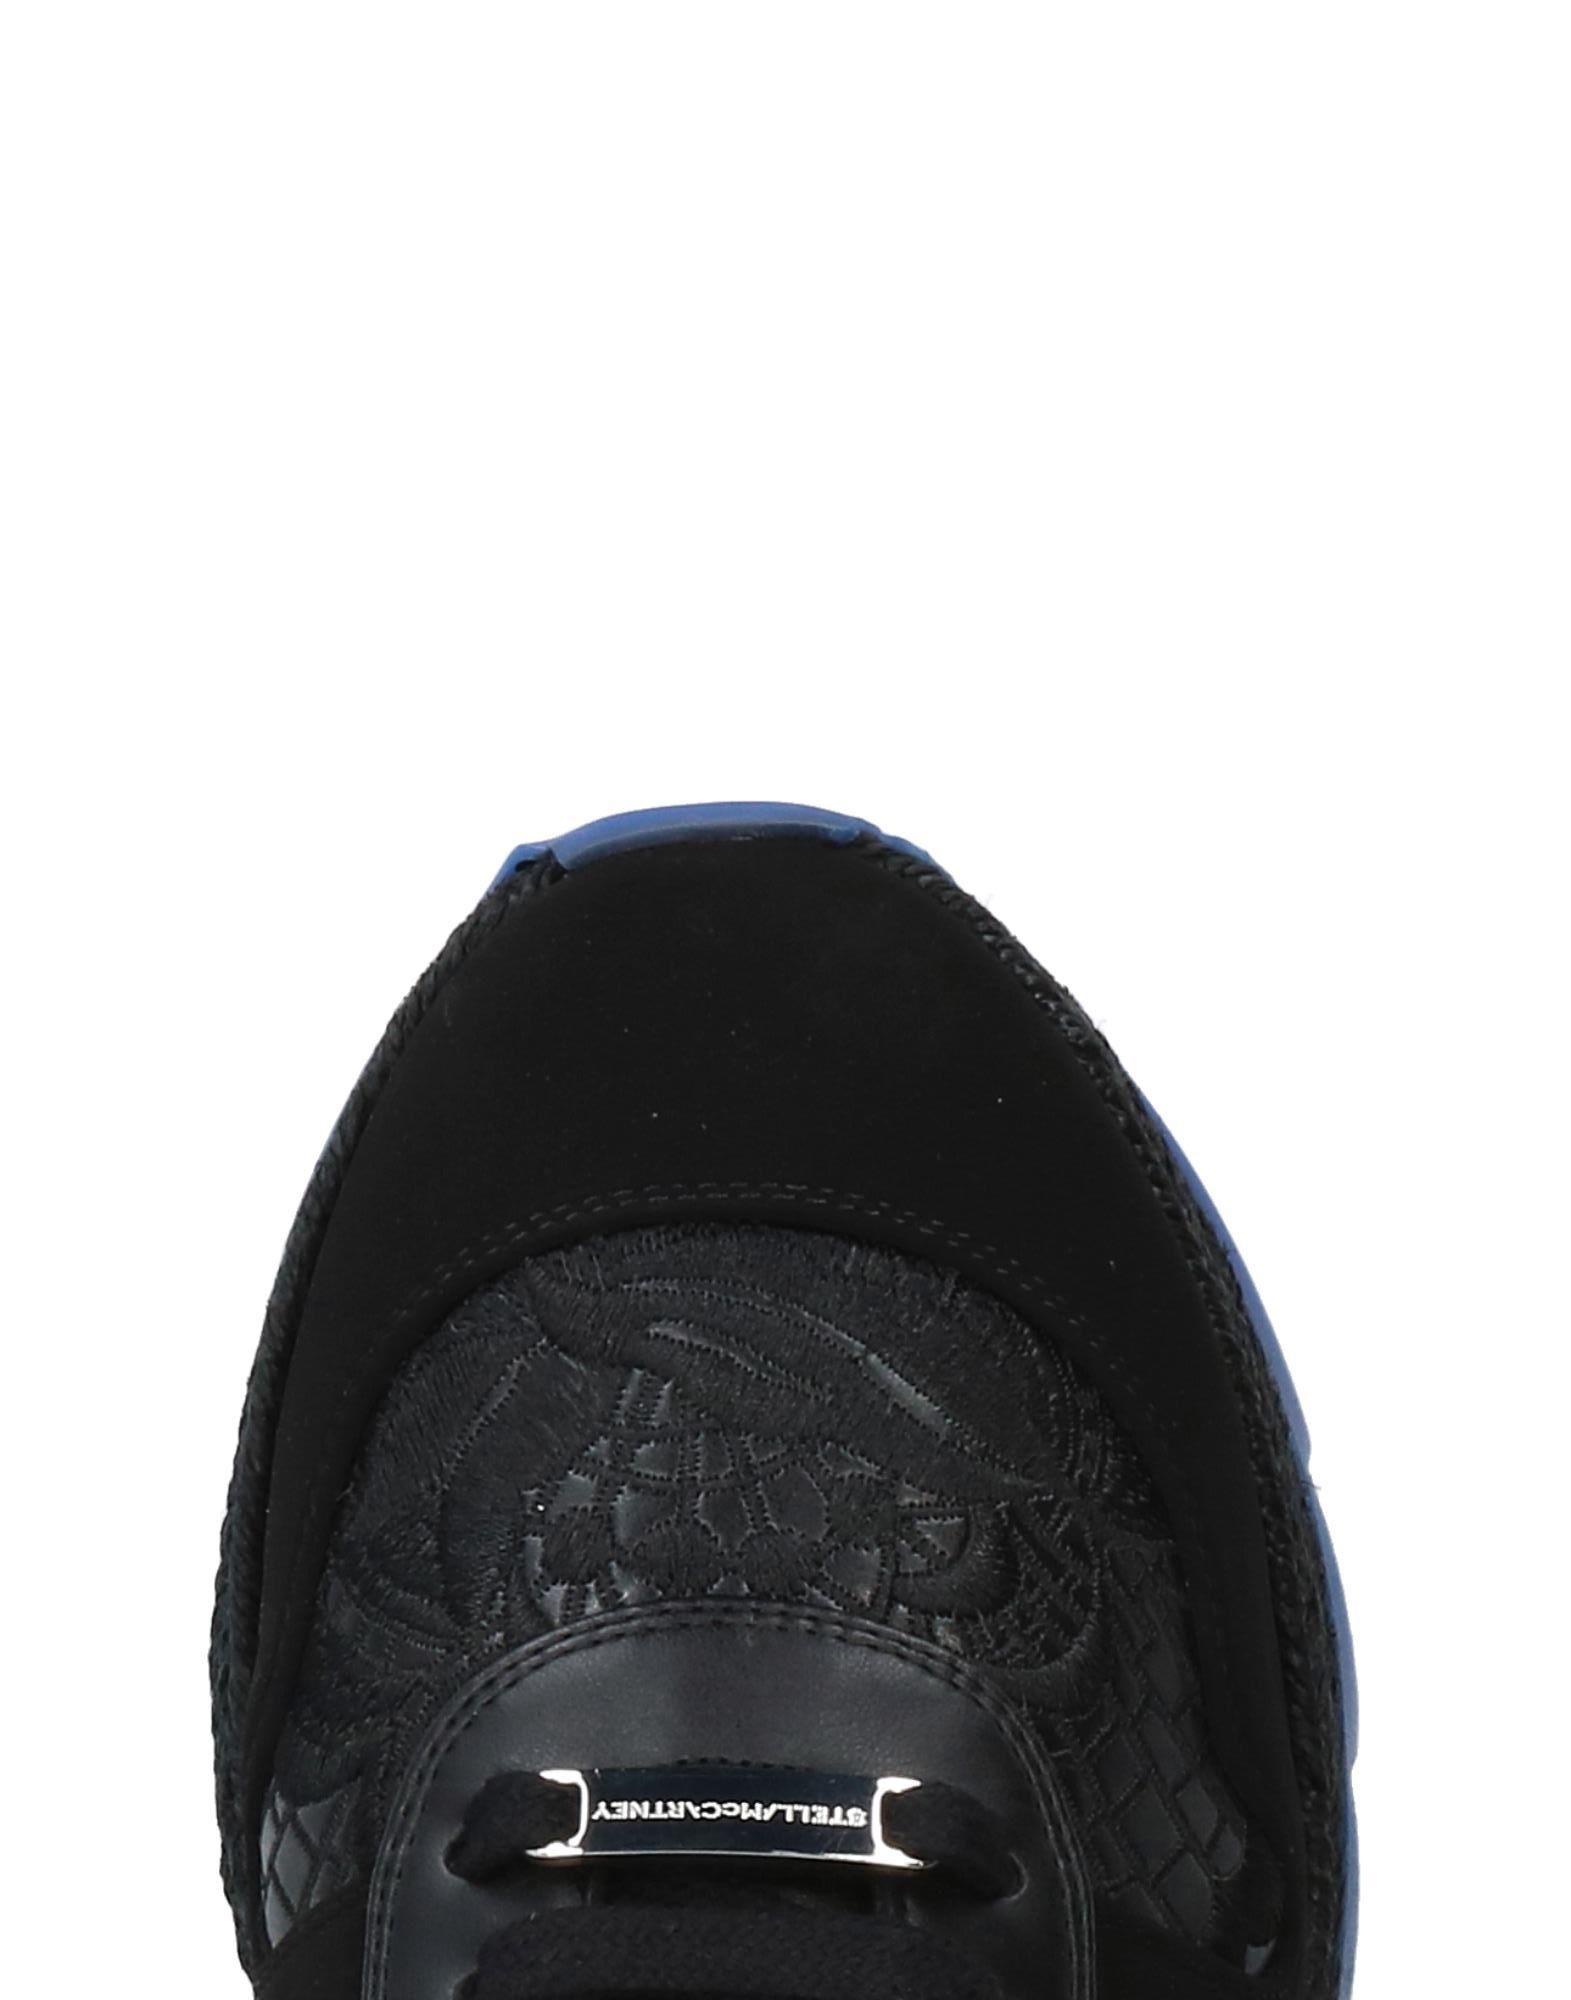 Stella Stella Stella Mccartney Sneakers Damen  11326842WT Beliebte Schuhe dc65bb